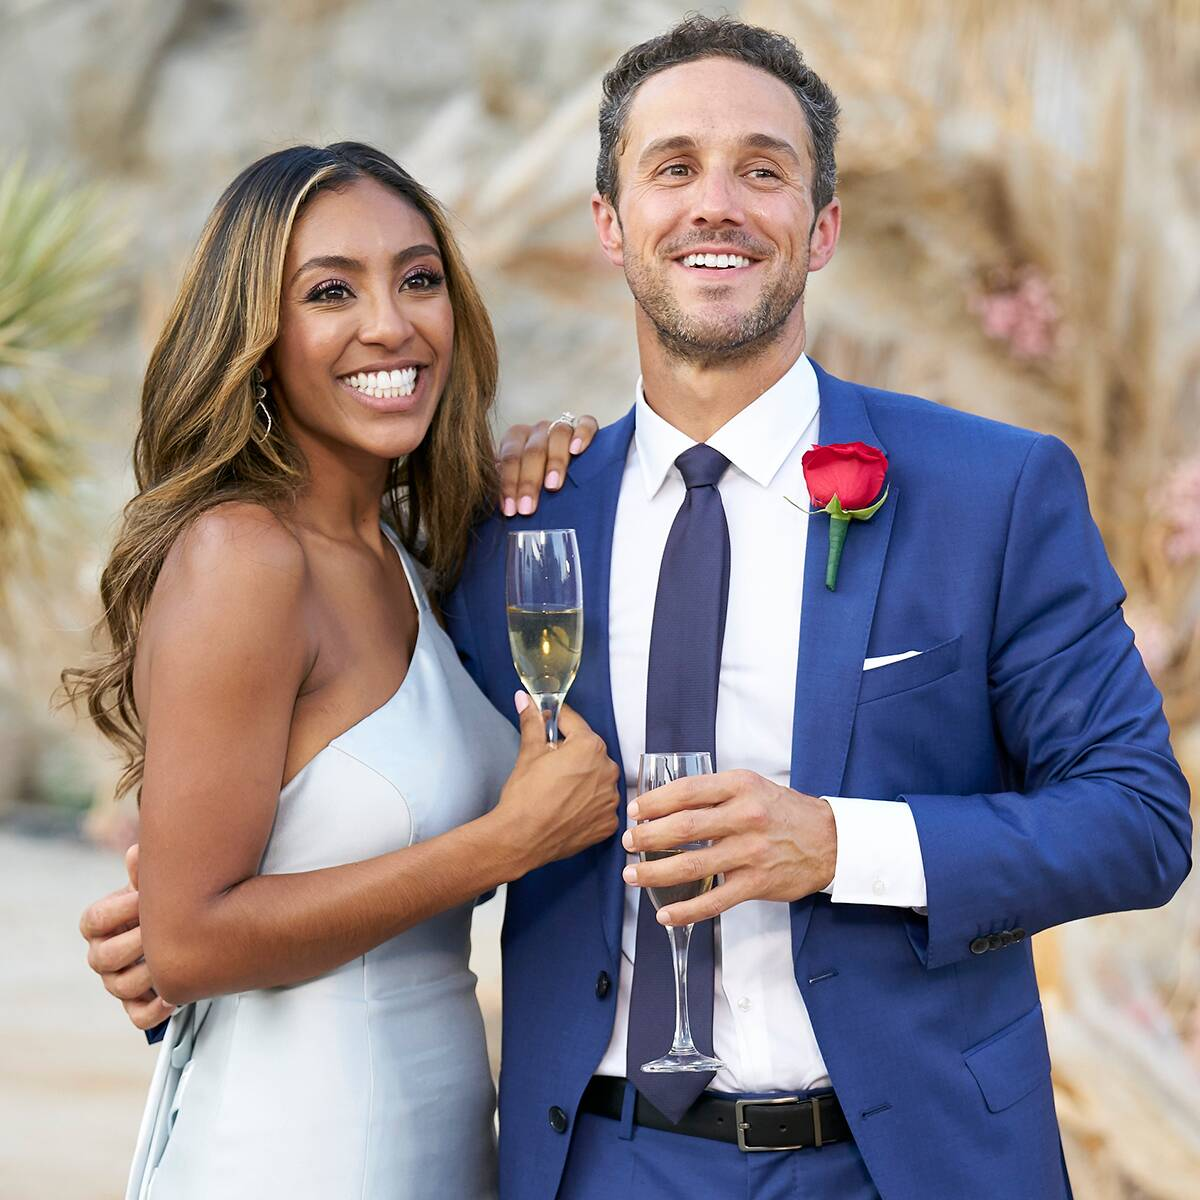 The Bachelorette's Tayshia Adams Sets the Record Straight on Zac Clark Breakup Rumors